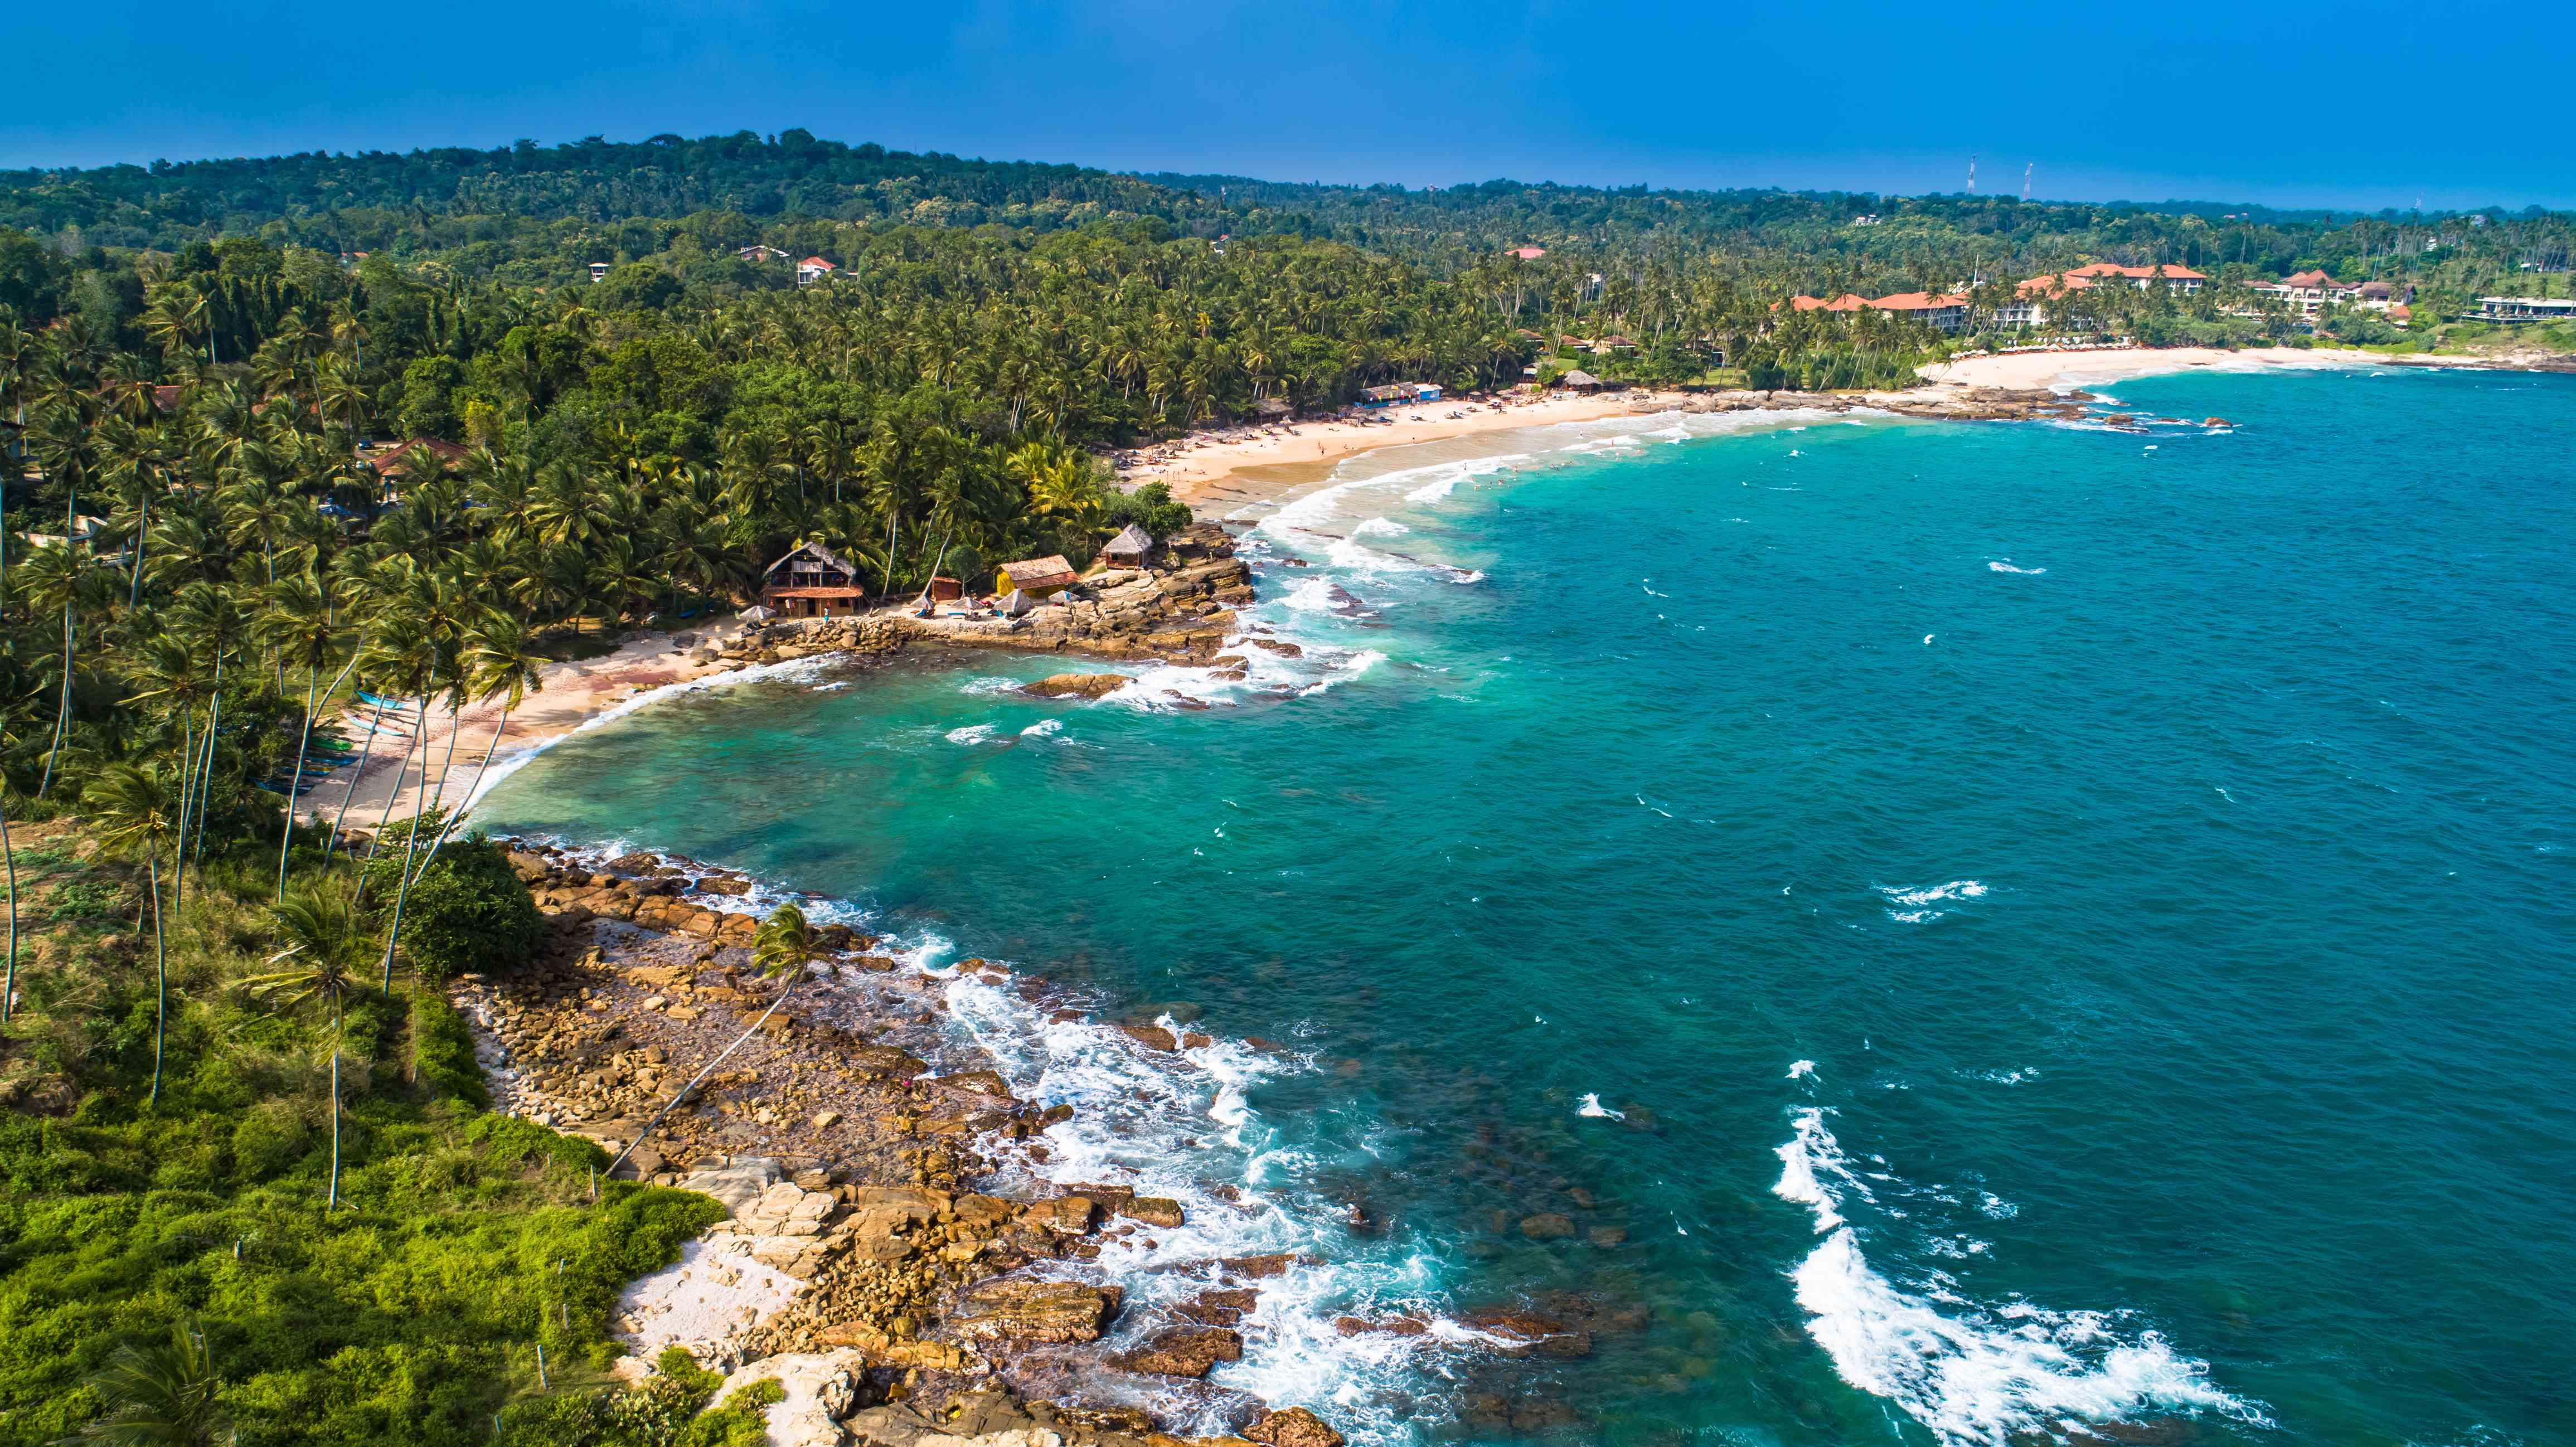 Goyambokka Beach and adjacent bays in Sri Lanka